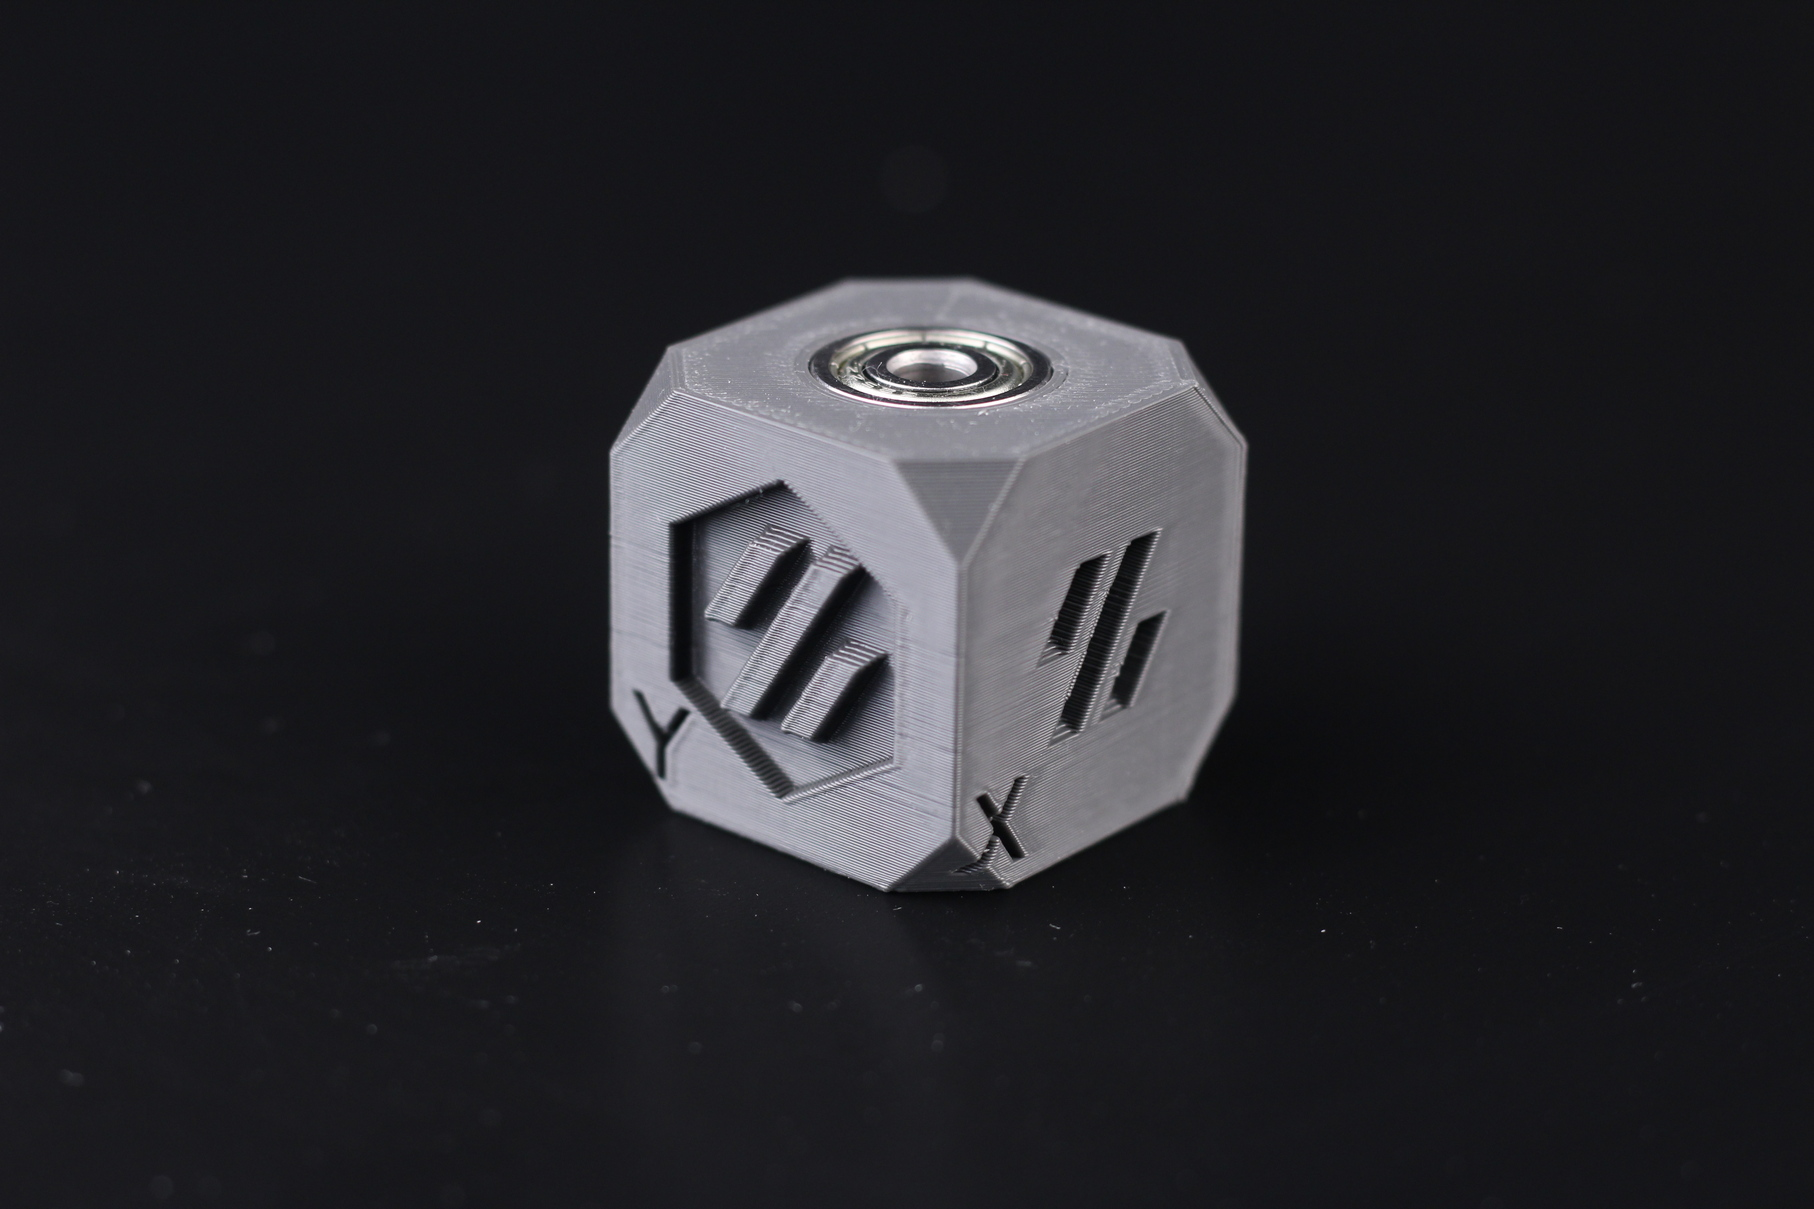 Voron-Cube-printed-on-Ender-3-Max-4